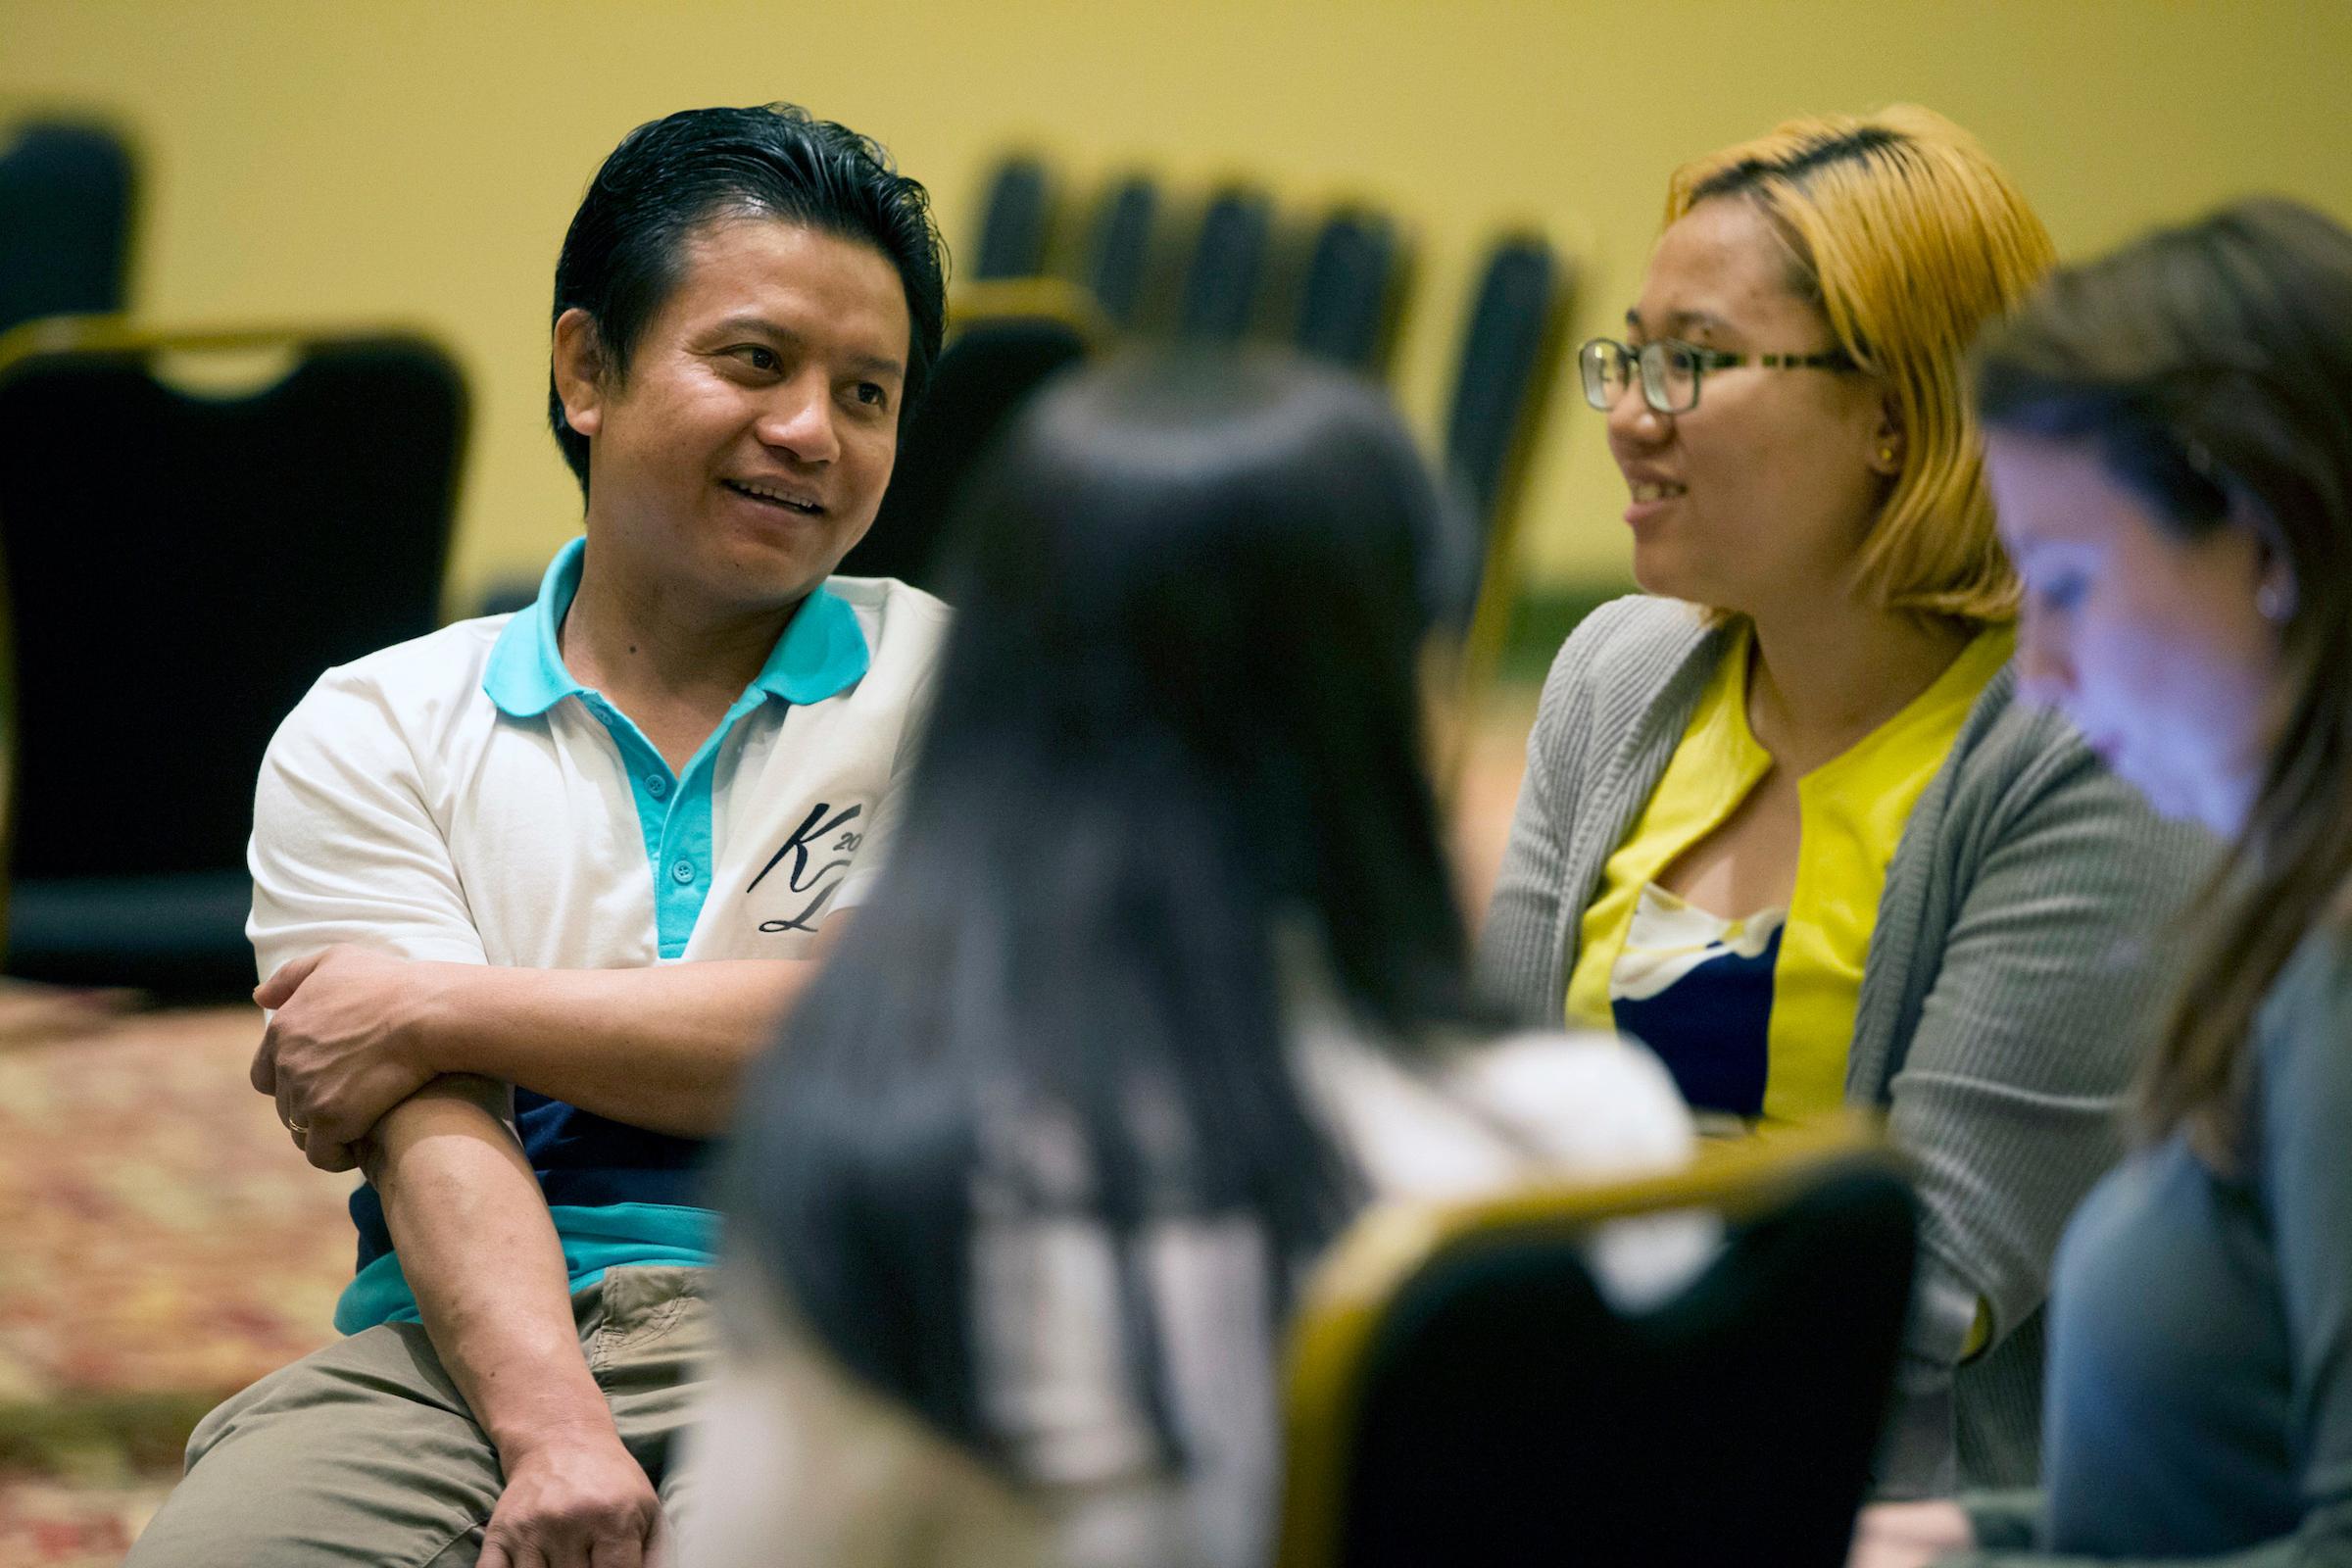 Building Integrated Communities Forum